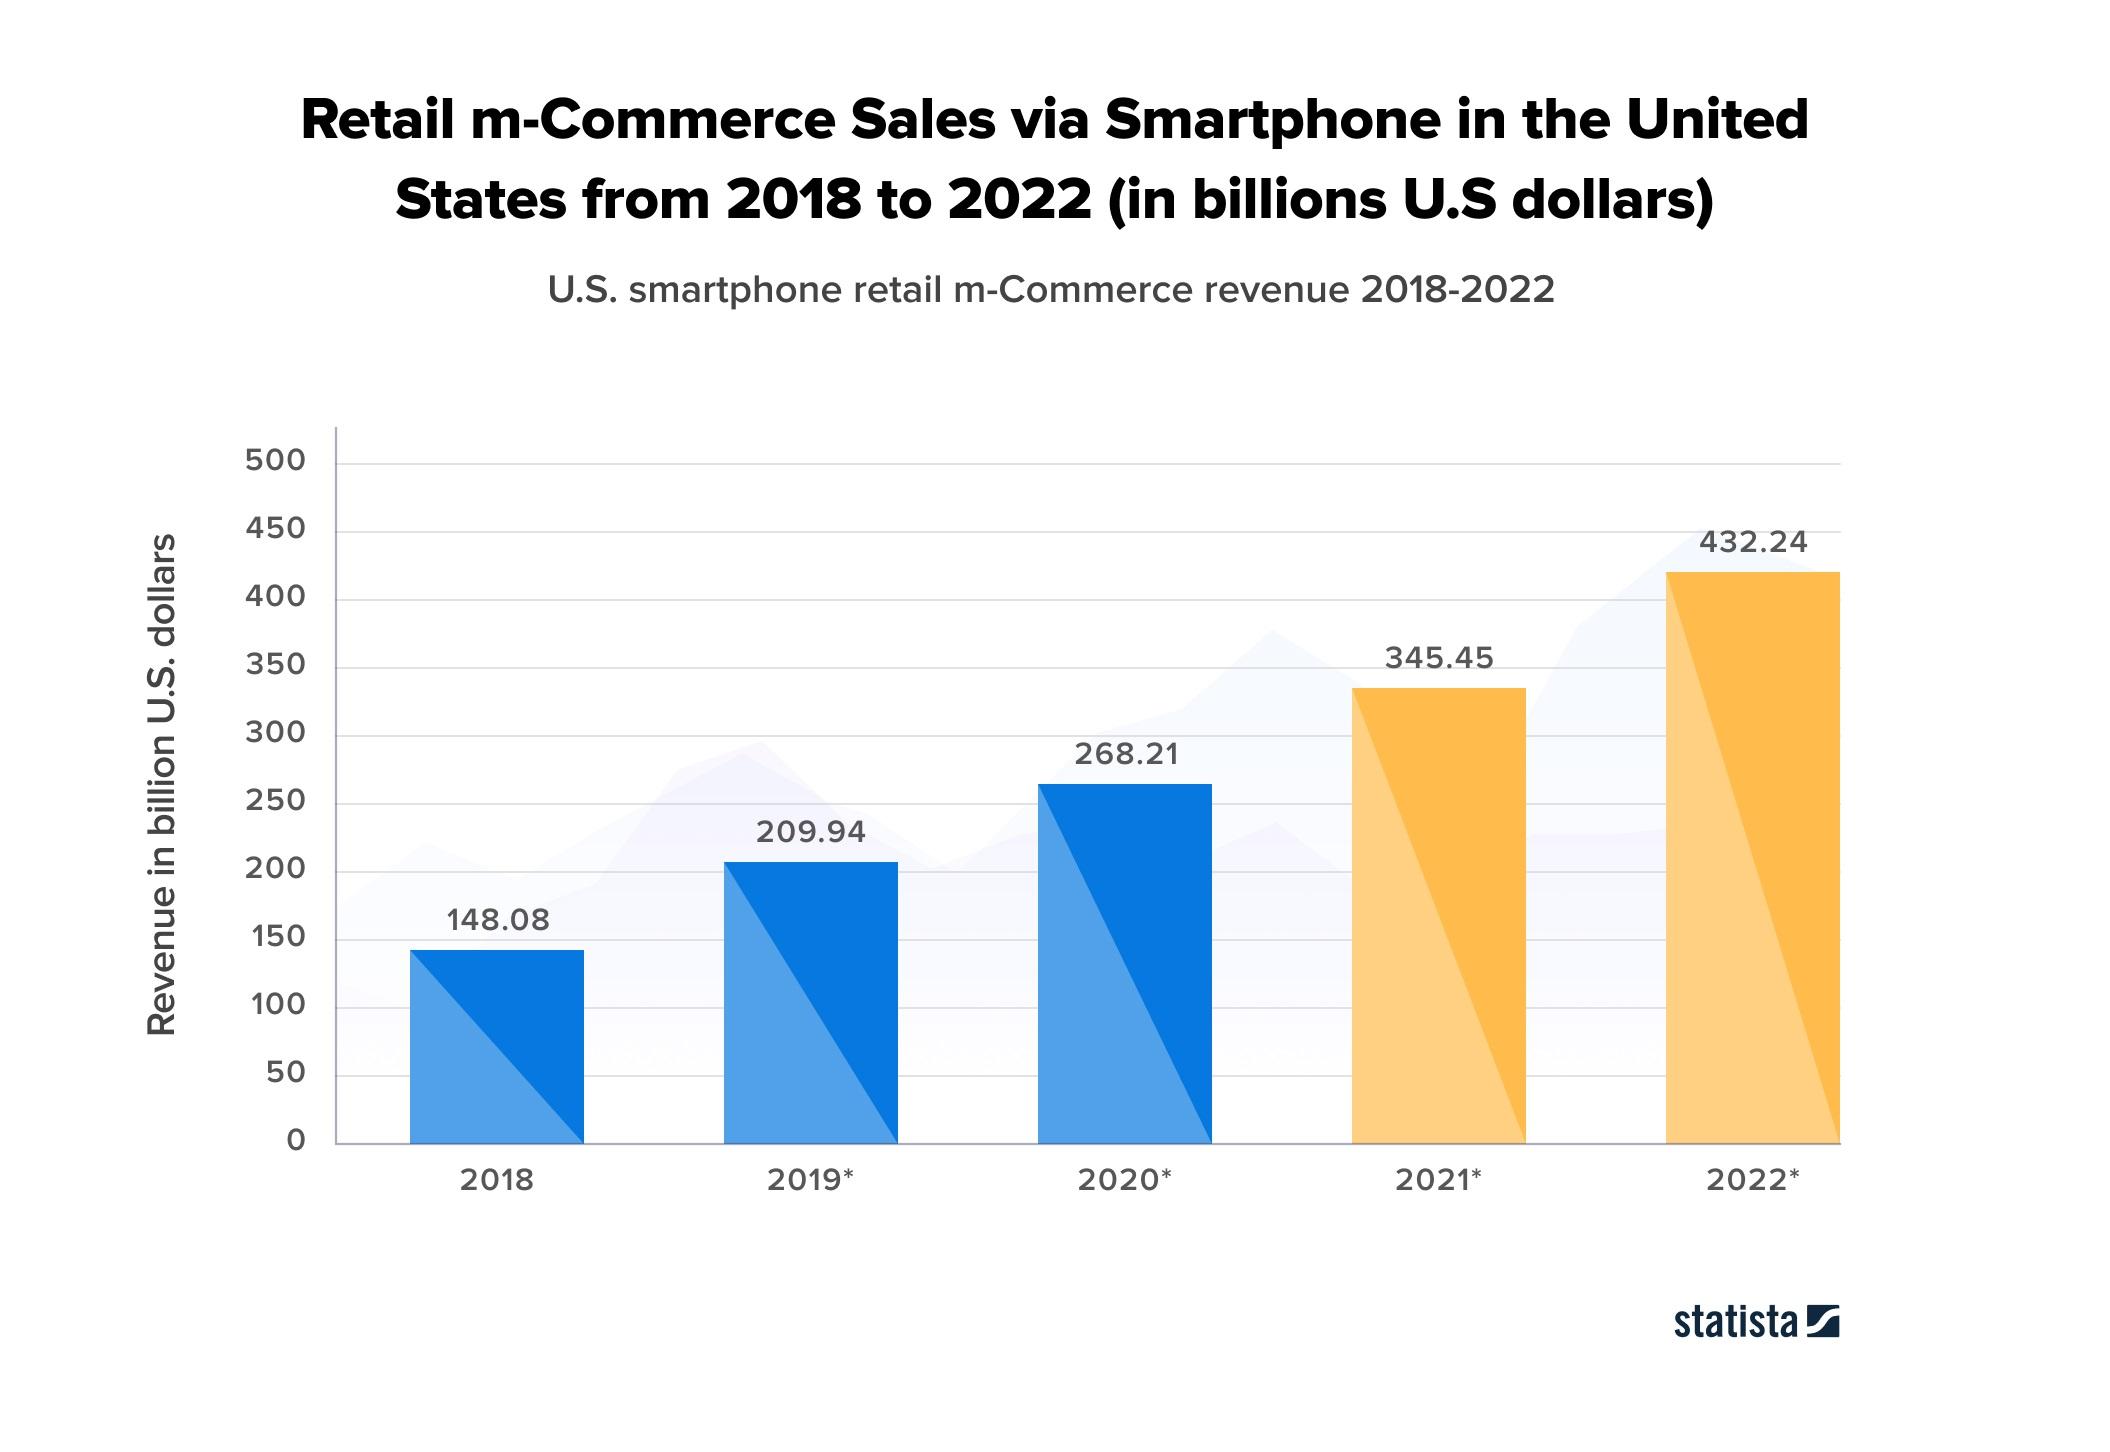 Retail m-commerce sales via Smartphone in United States